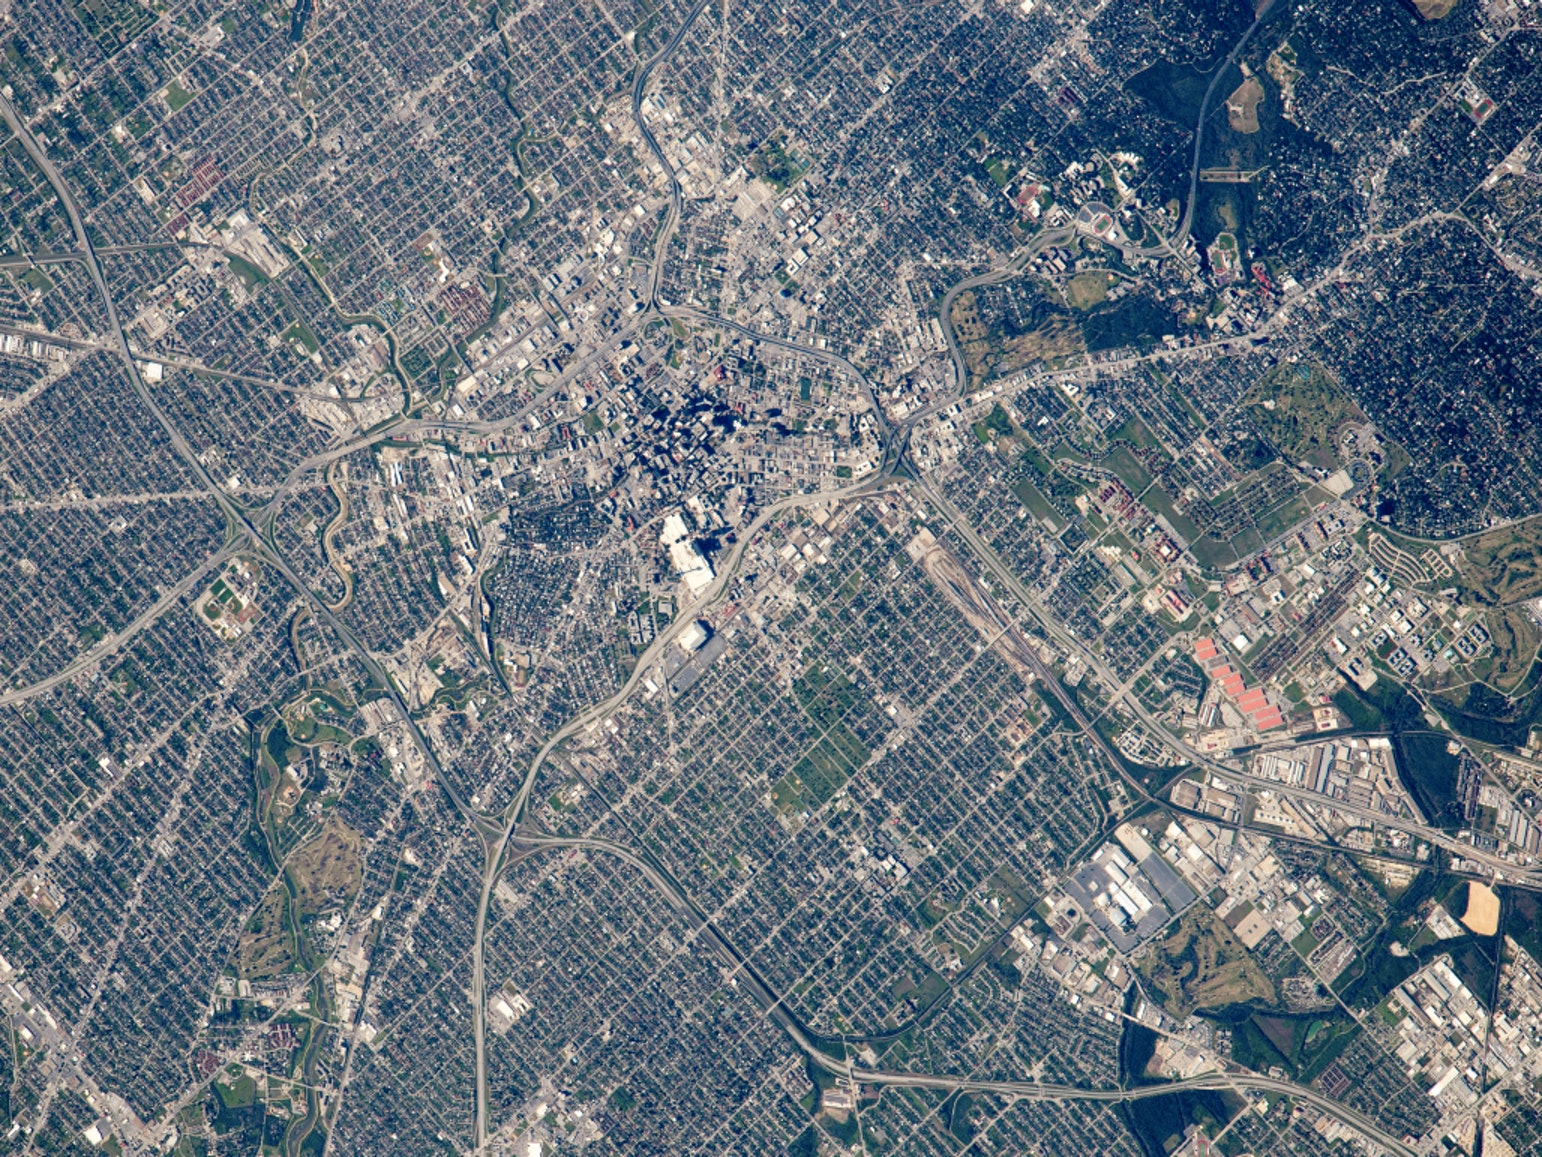 San Antonio looks good from space, the future.